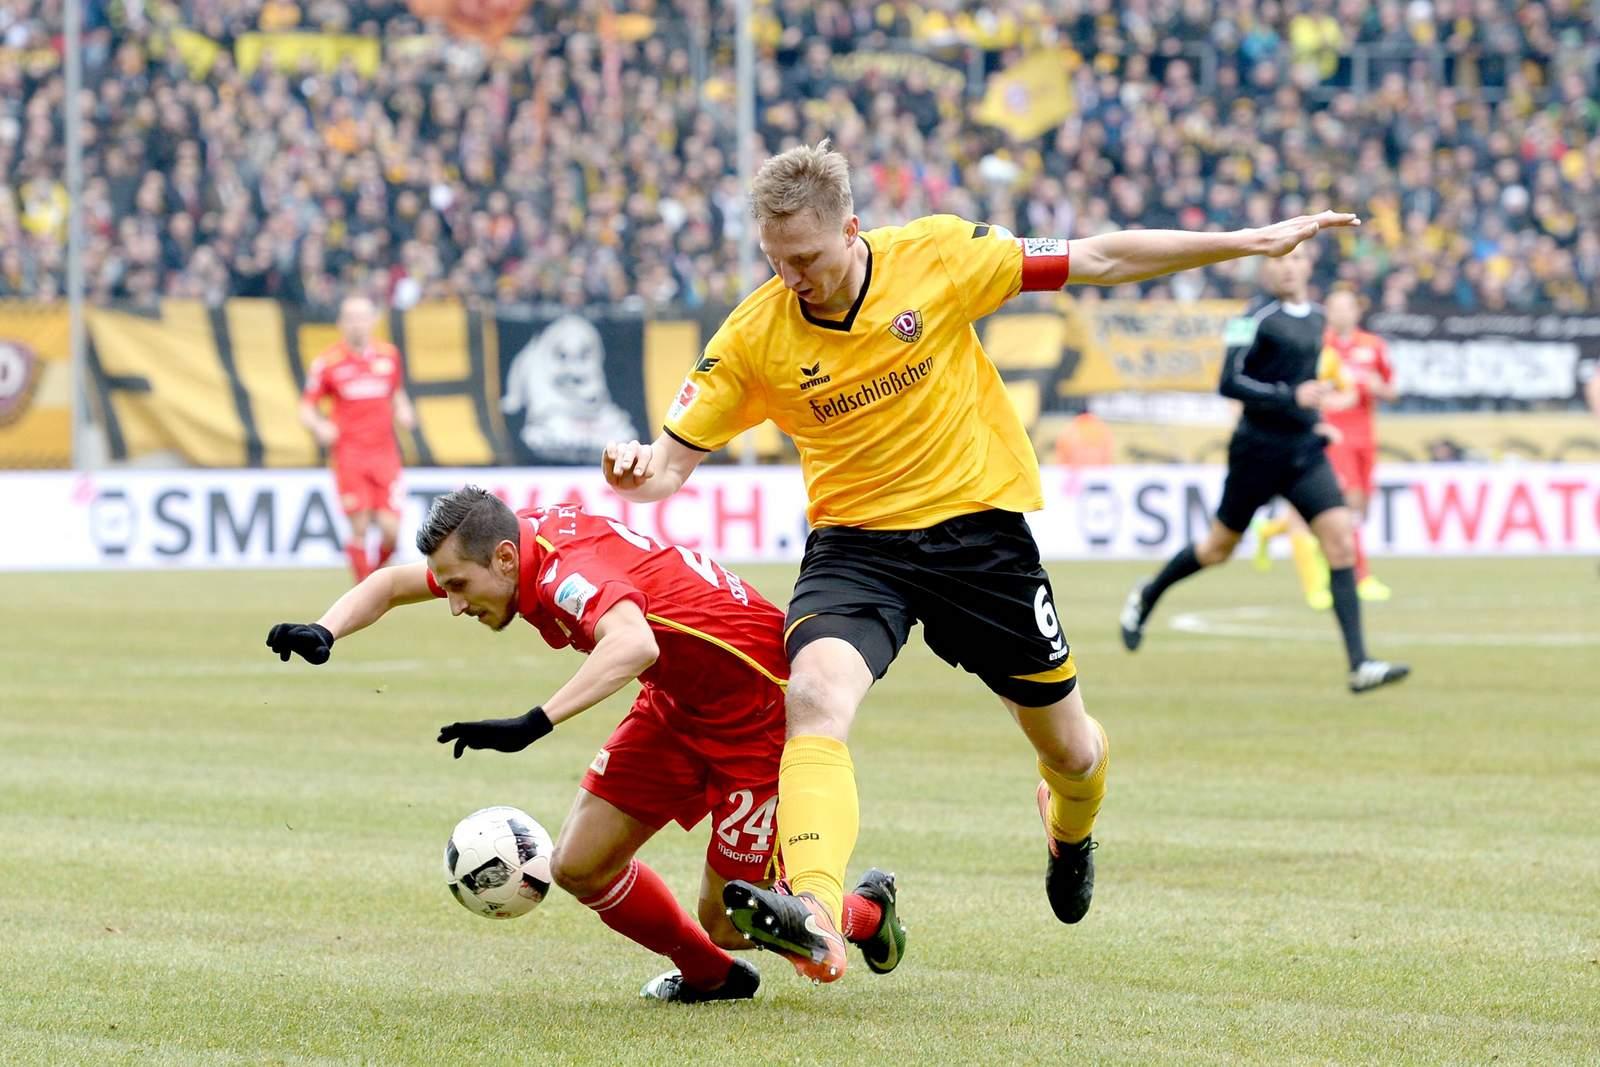 Marco Hartmann Bringt Steven Skrzybski Zu Fall Jetzt Auf Dresden Gegen Union Wetten